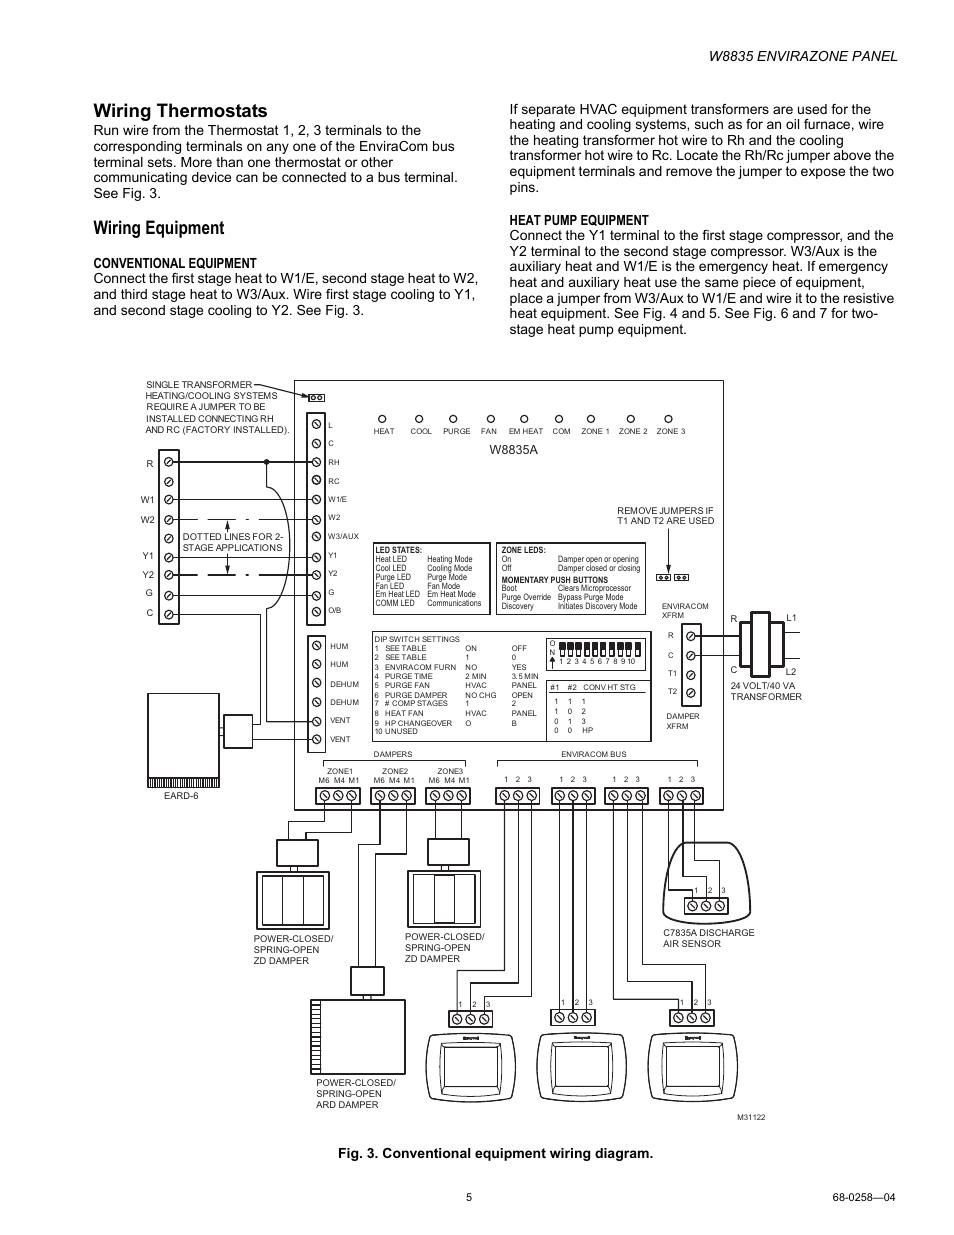 Plan Heating System Diagram On Honeywell Boiler Wiring Diagrams